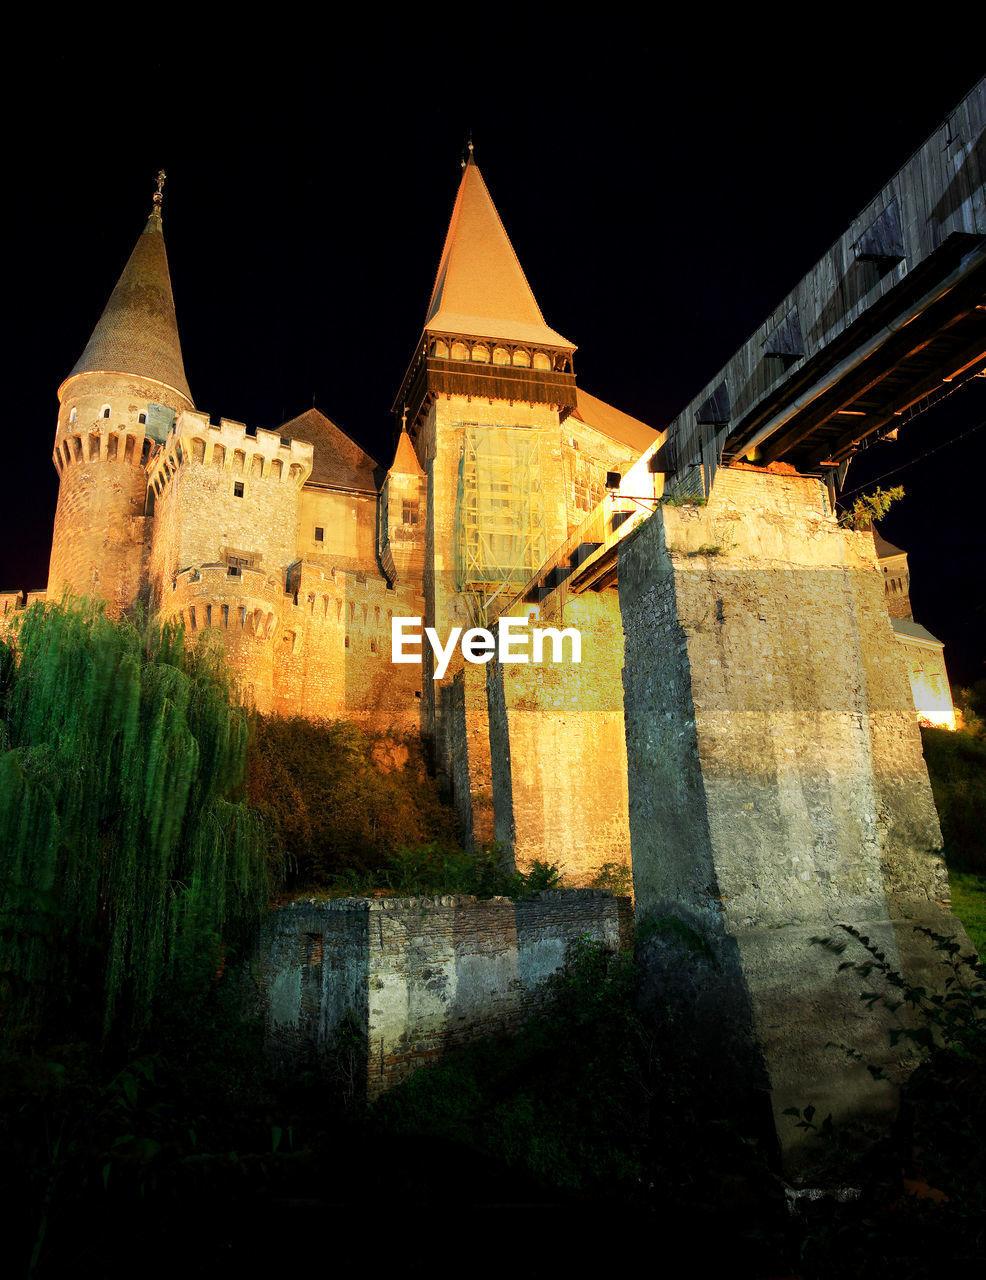 Illuminated corvin castle against blue sky